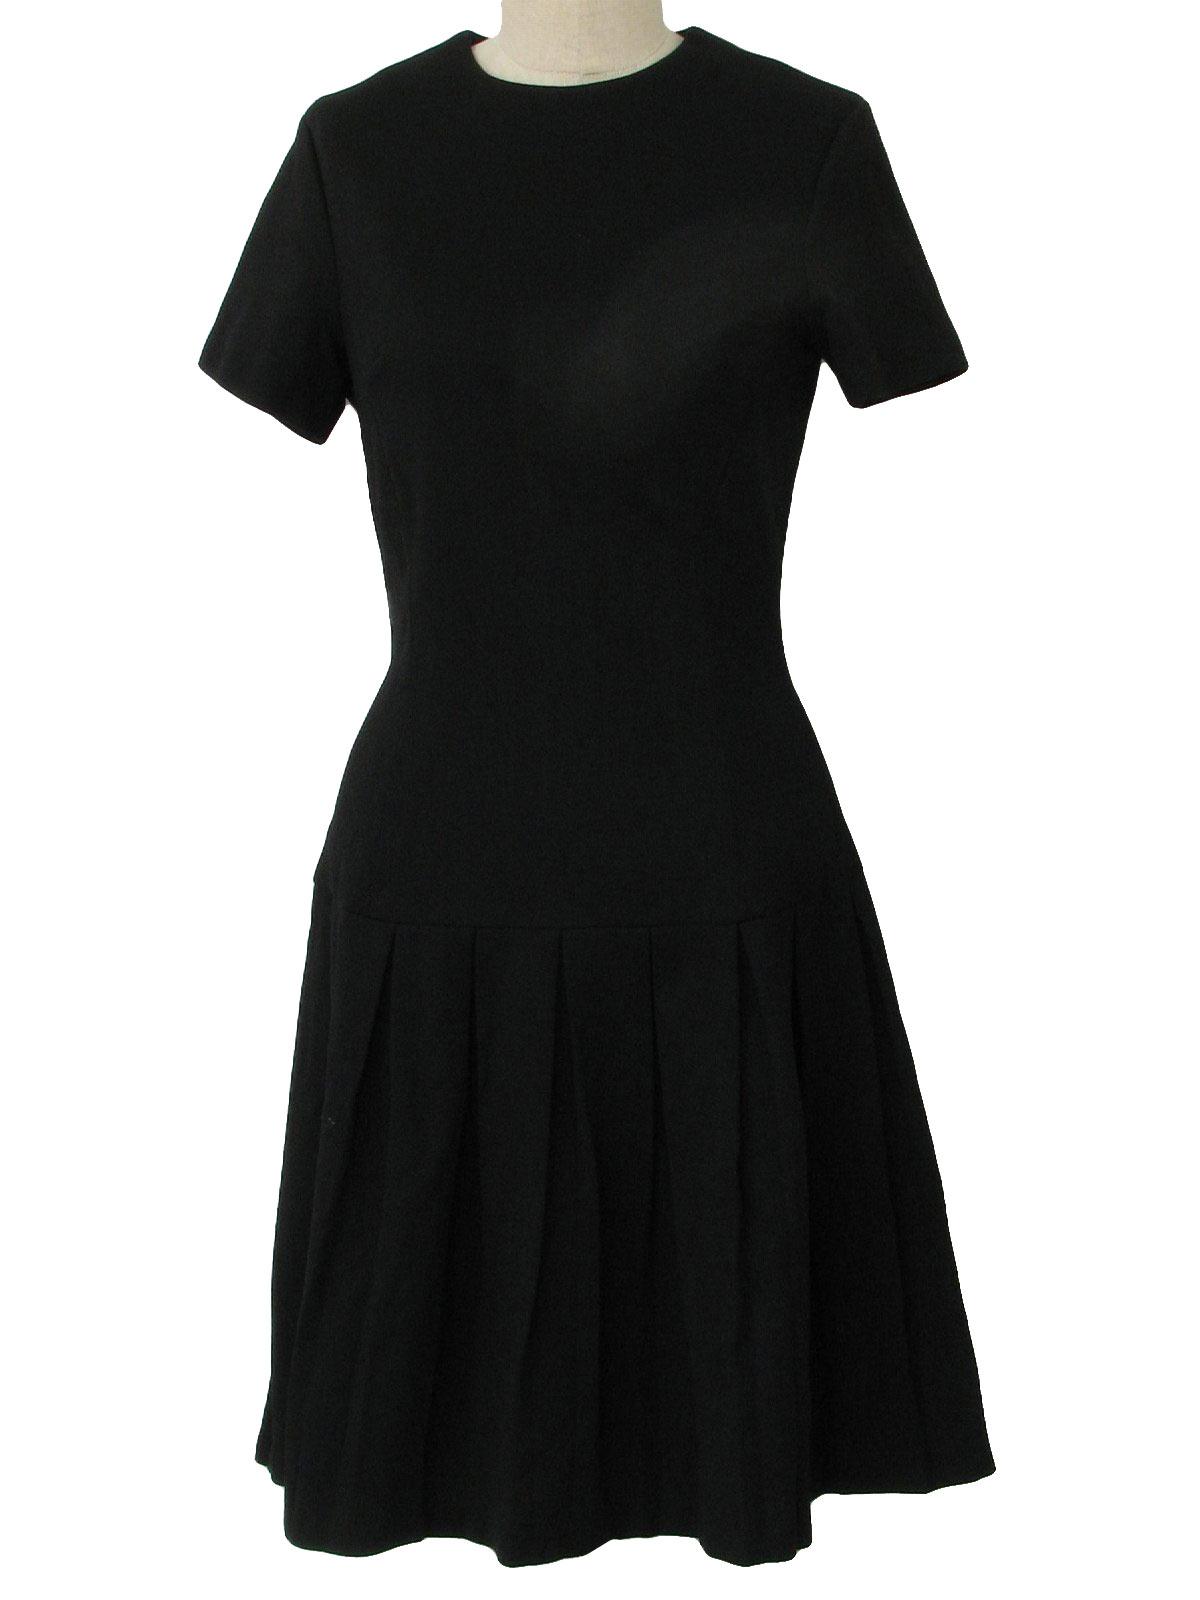 Shellys Tall Girl 1970s Vintage Dress 70s Shellys Tall